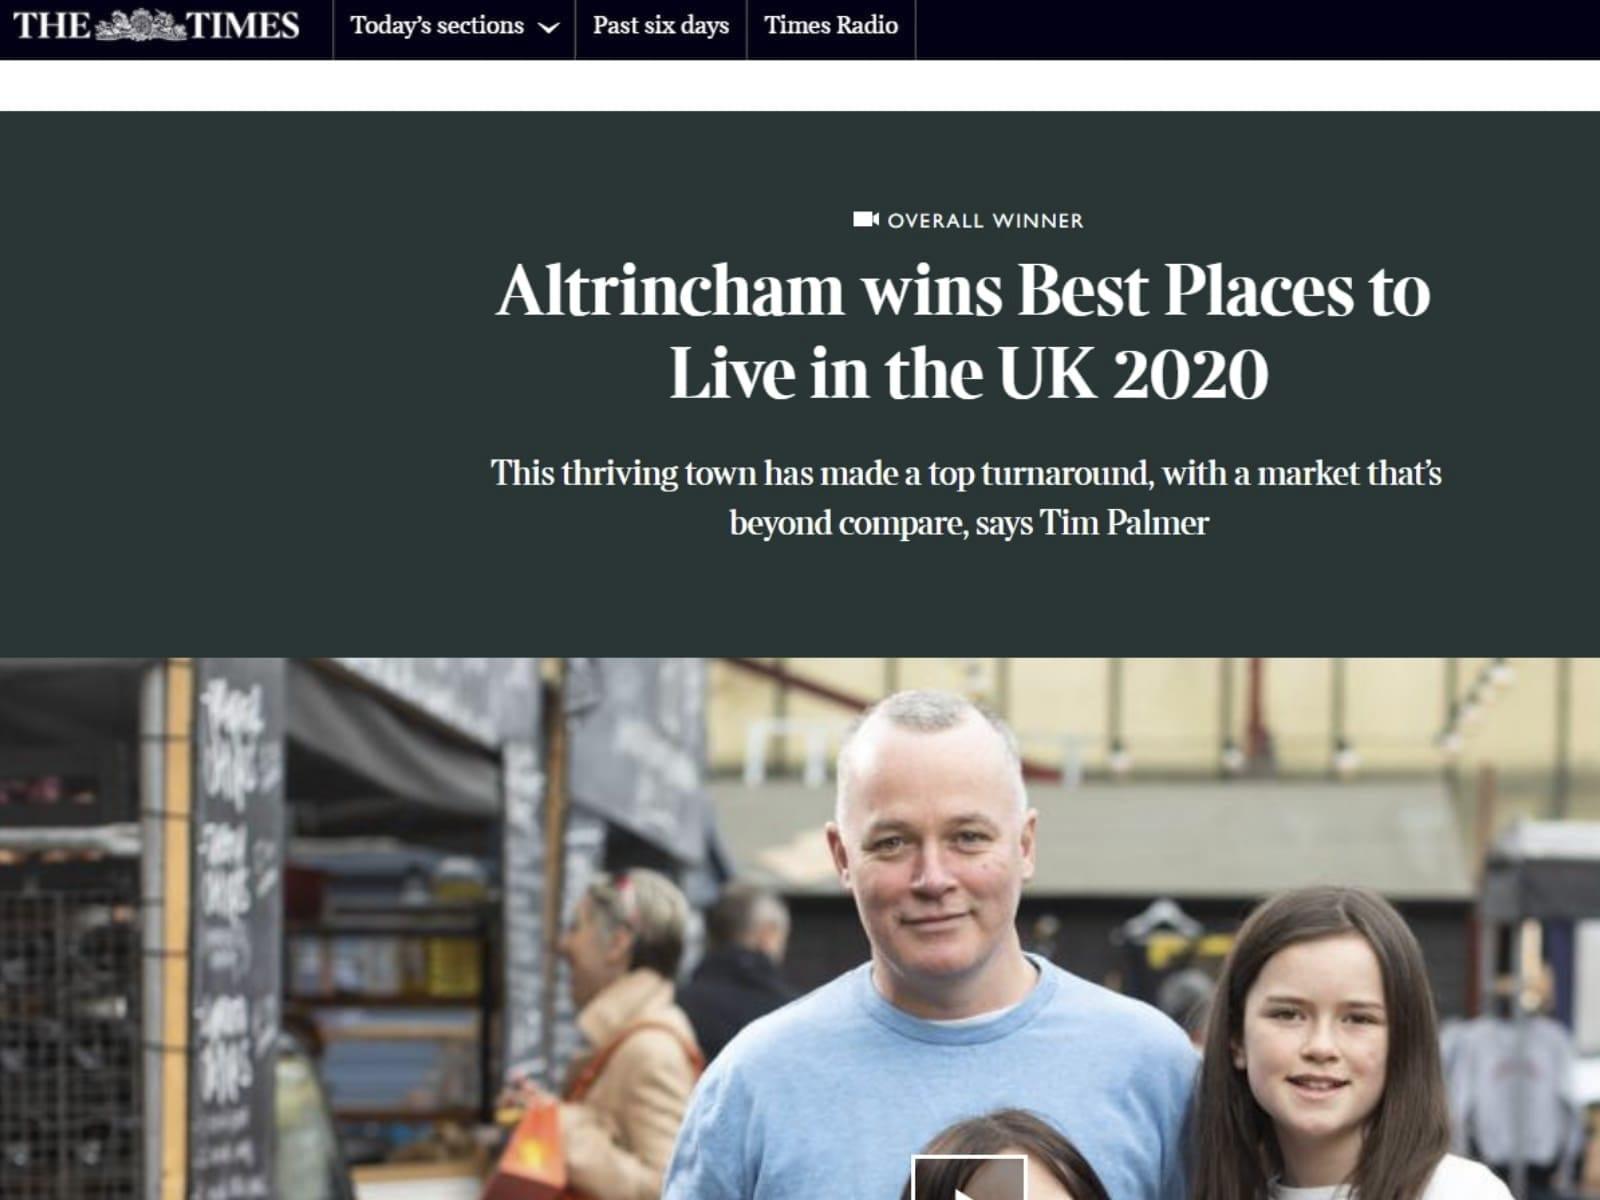 Altrincham Image 02